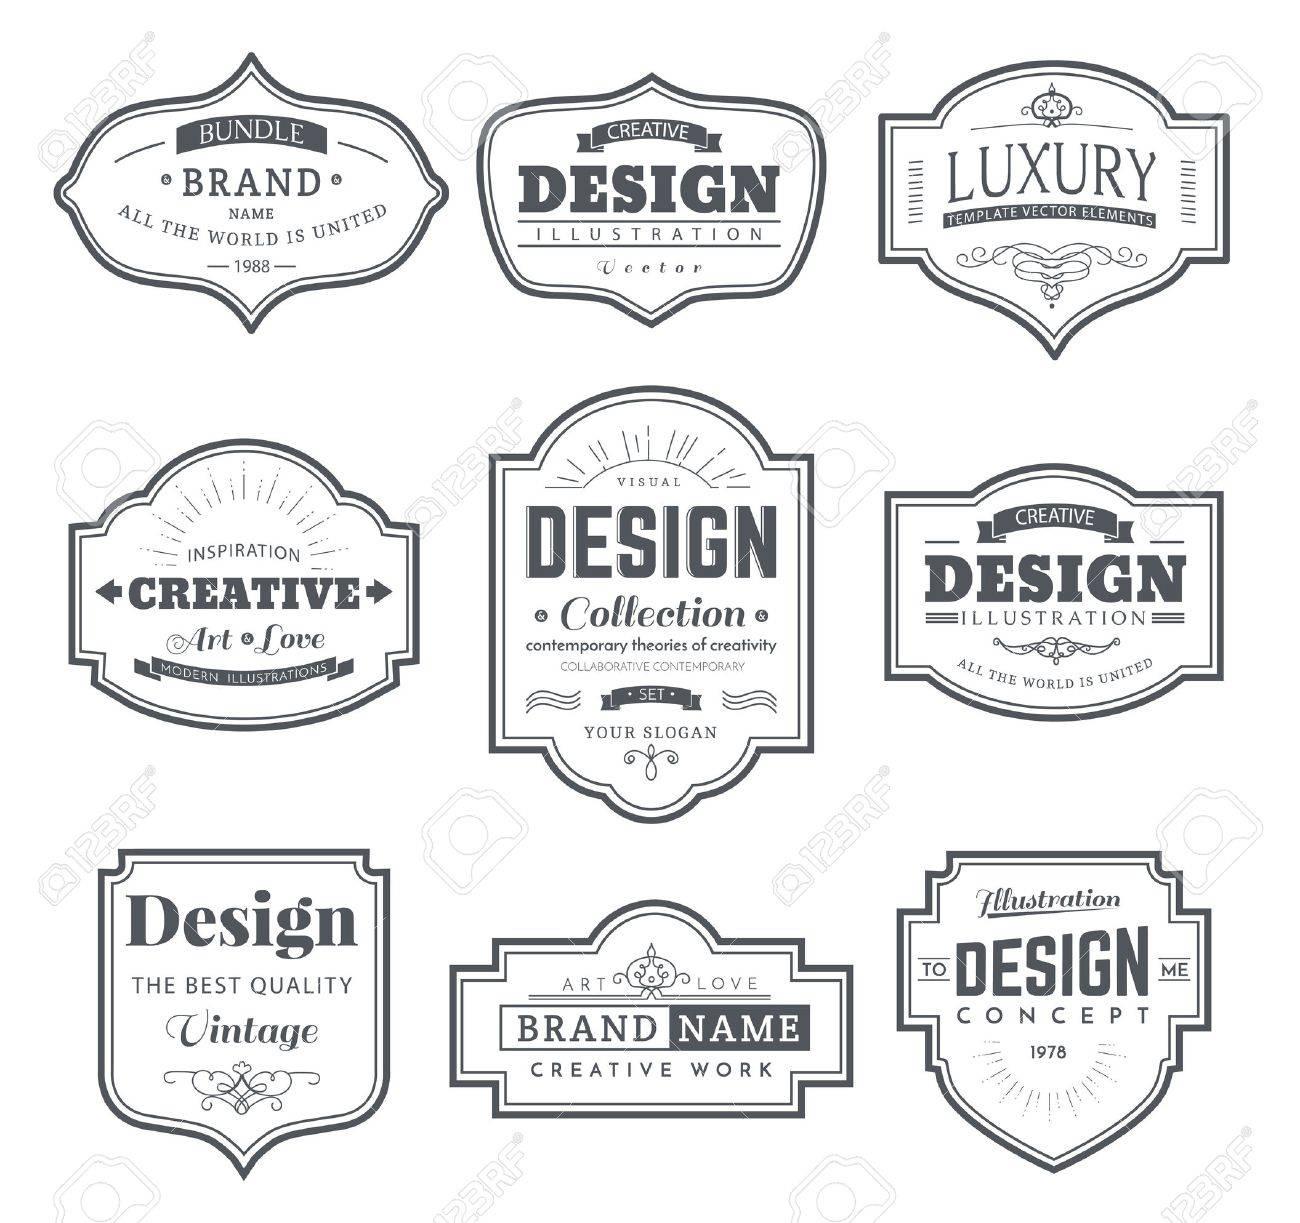 Frame classic template. Vintage contour blank frames and labels. Vintage elements design for cafe, restaurant, boutique, hotel, shop, jewelry. Vector retro elements - 58325614